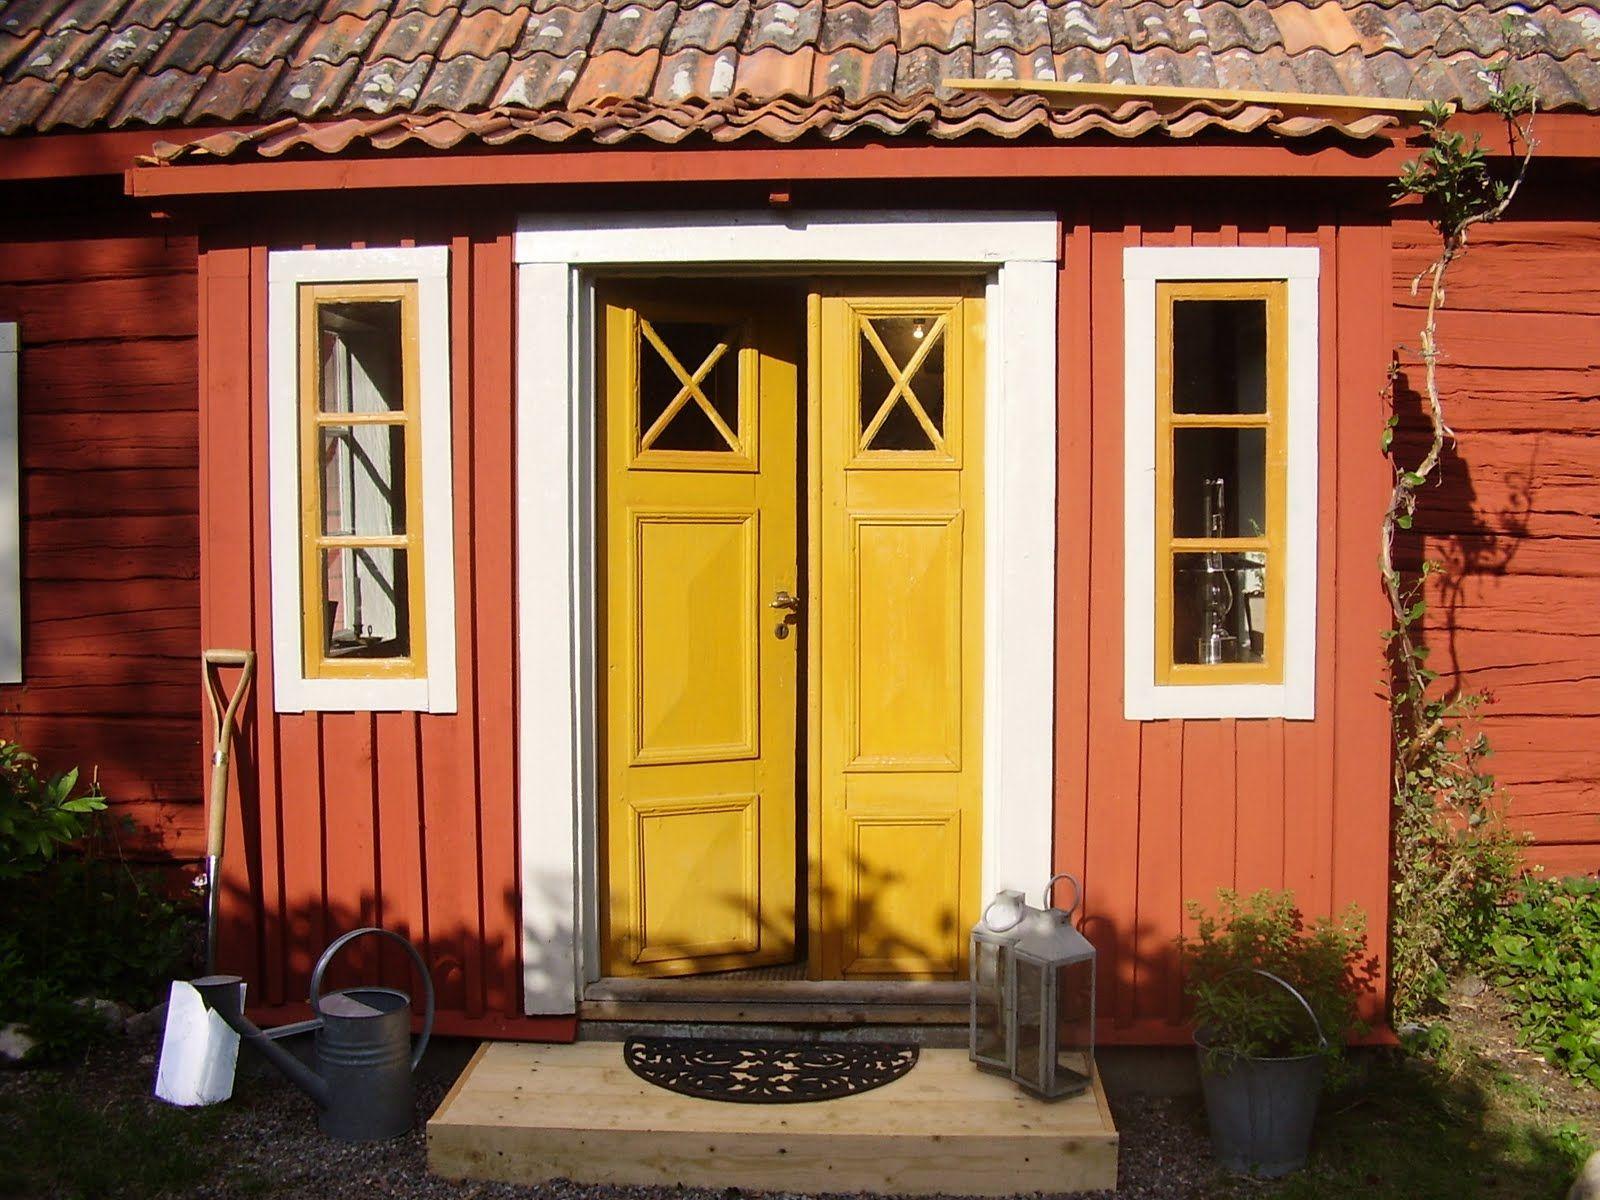 1000+ images about Nytt hus - fasad/entré/planlösning on Pinterest